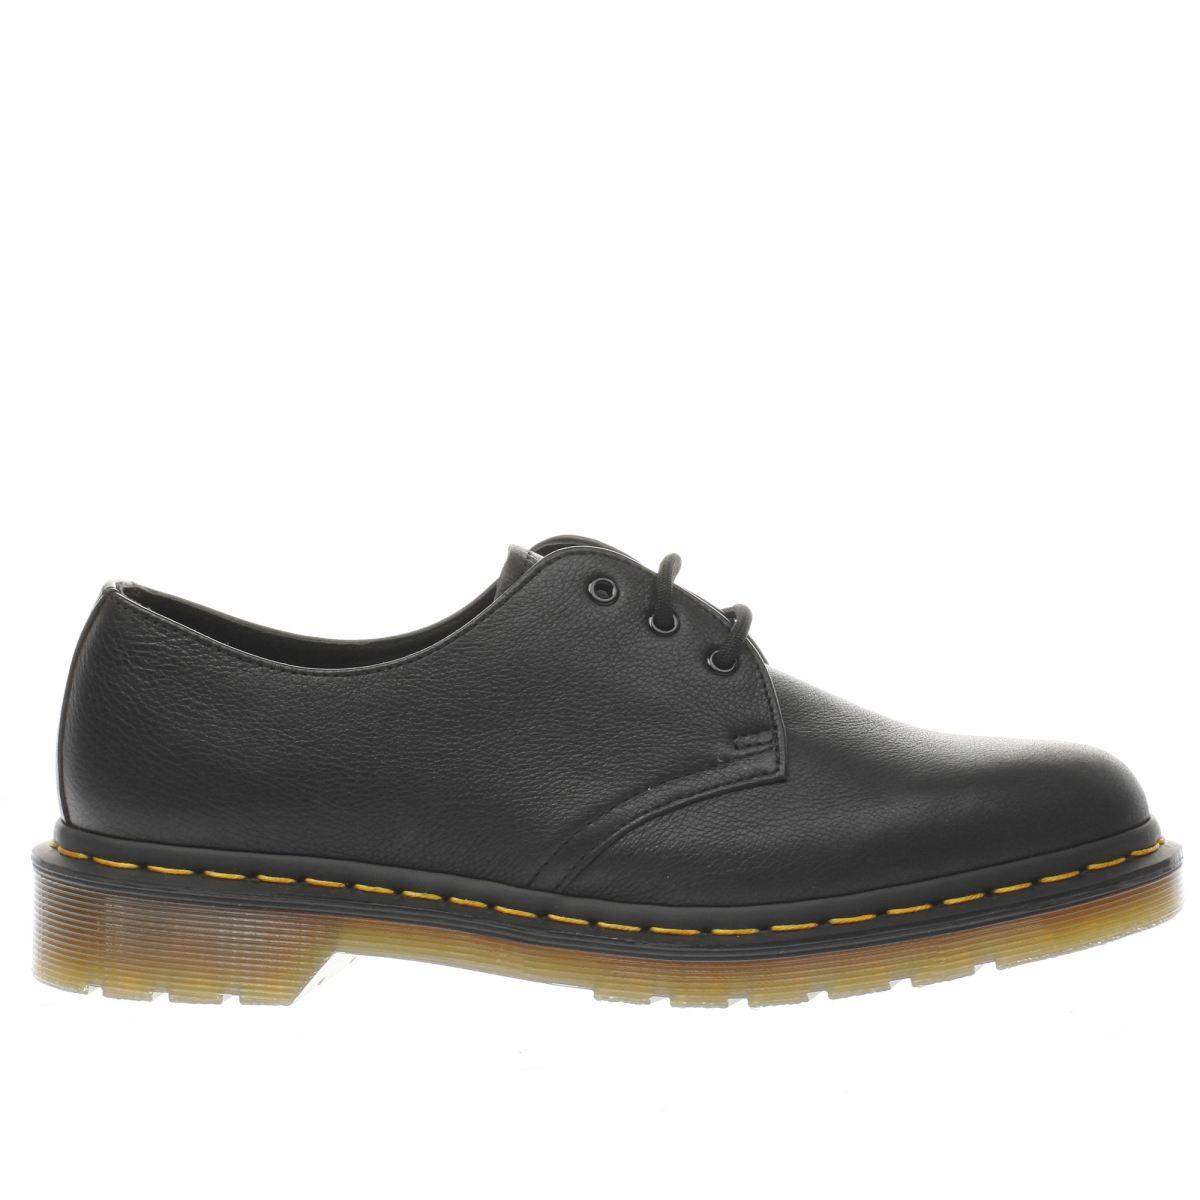 dr martens black 1461 3 eye shoe flat shoes